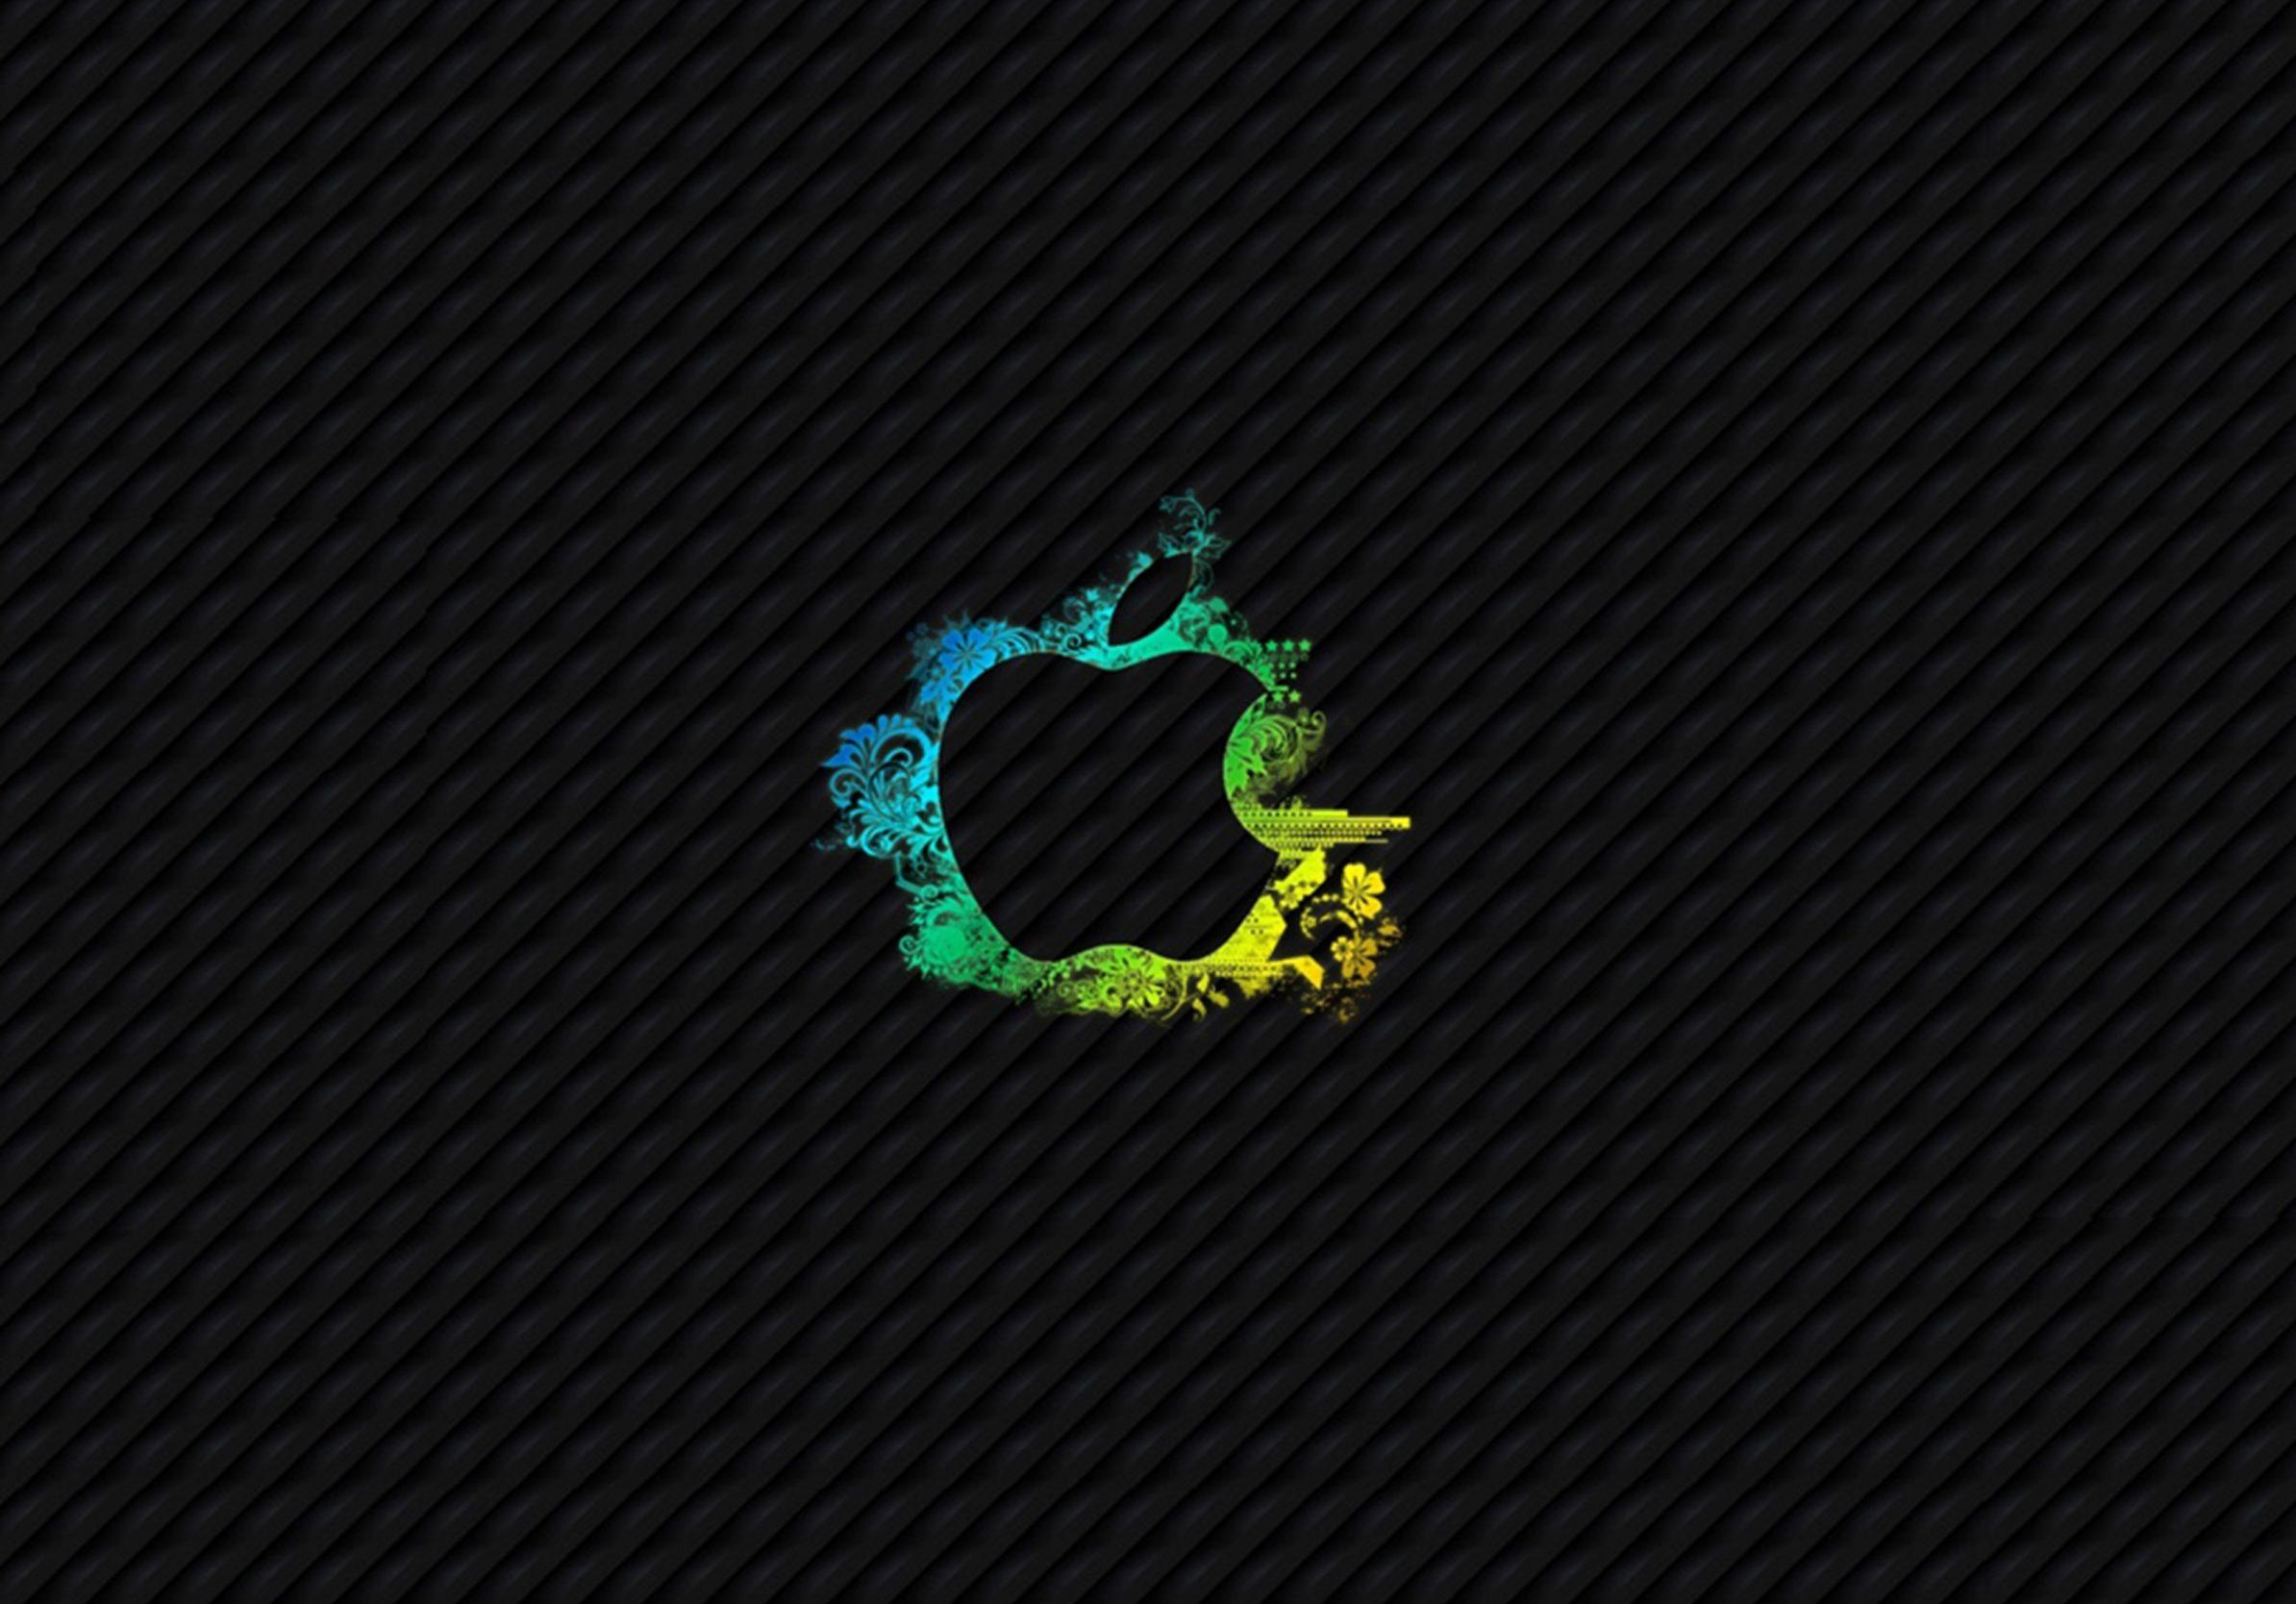 2388x1668 iPad Pro wallpapers Apple Wallpaper Ipad Wallpaper 2388x1668 pixels resolution